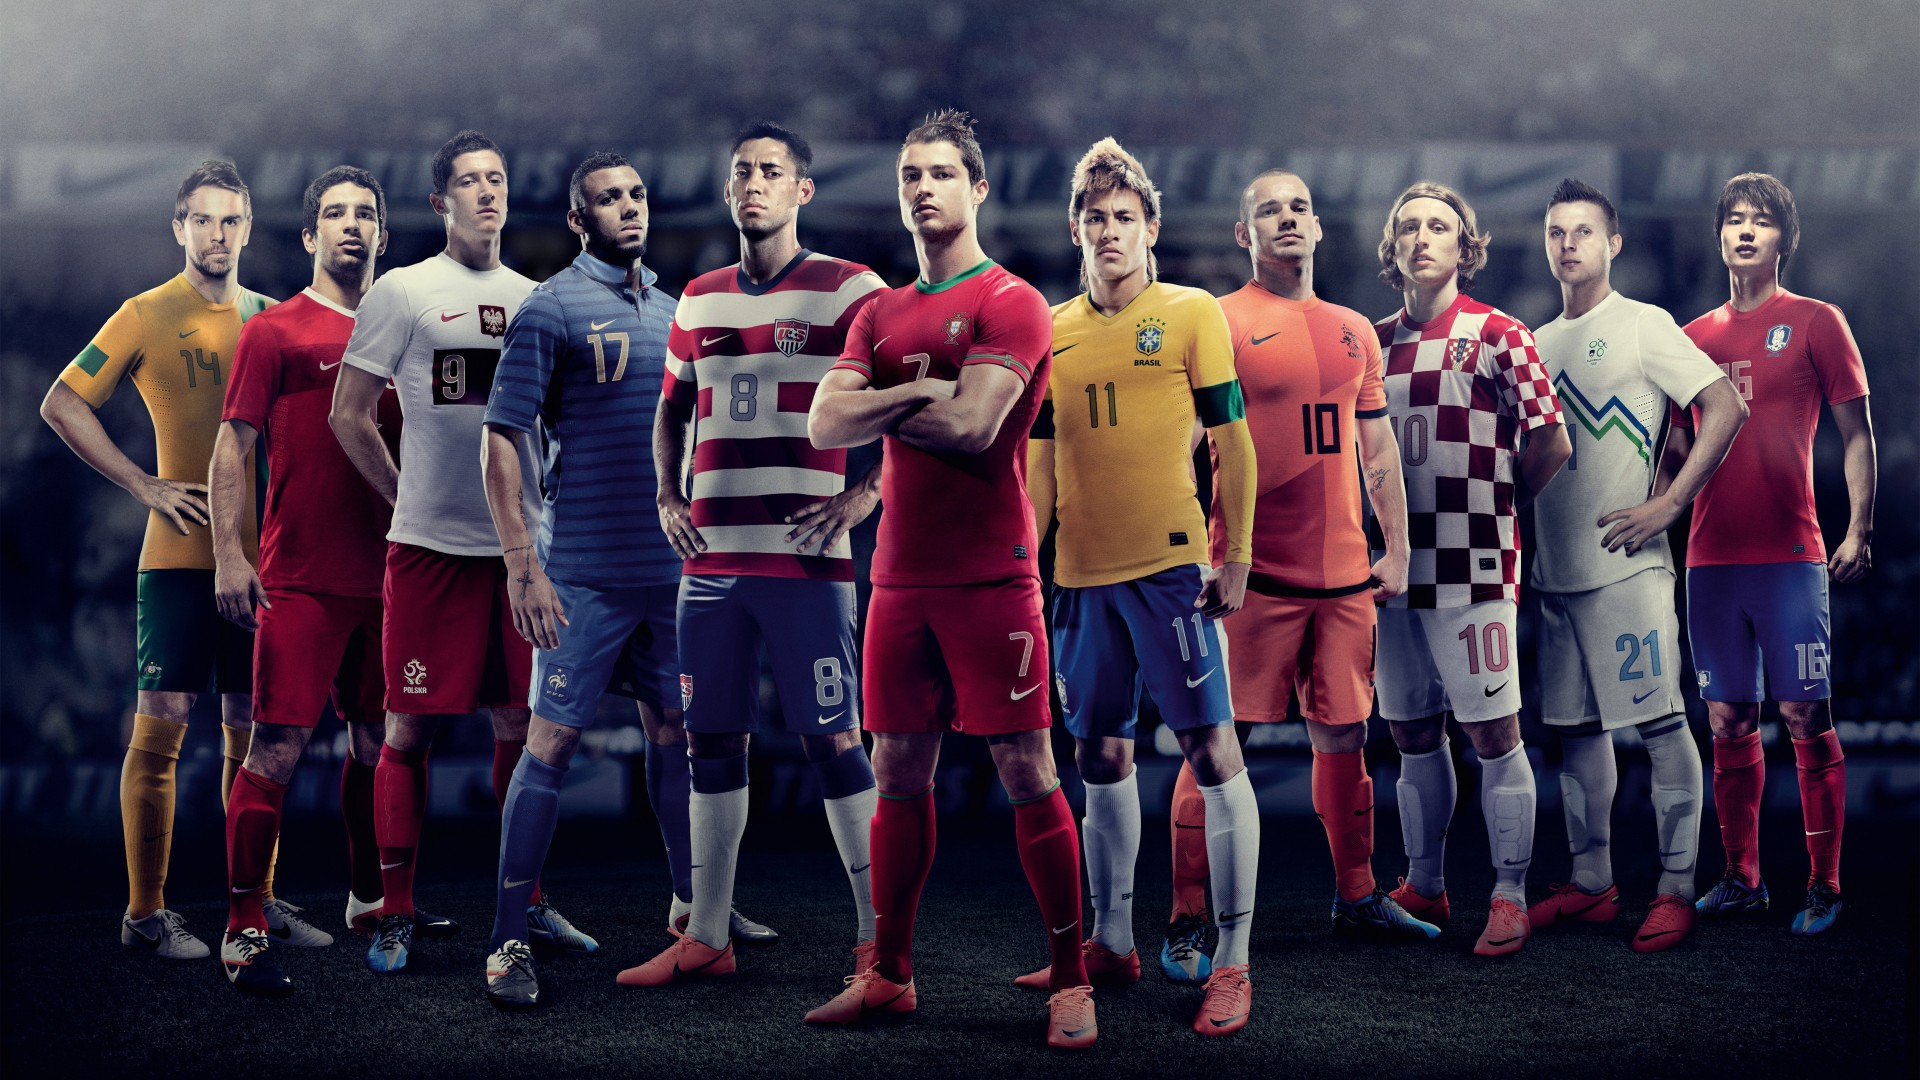 EURO 2012 Nike Football Wallpapers HD 1920x1080